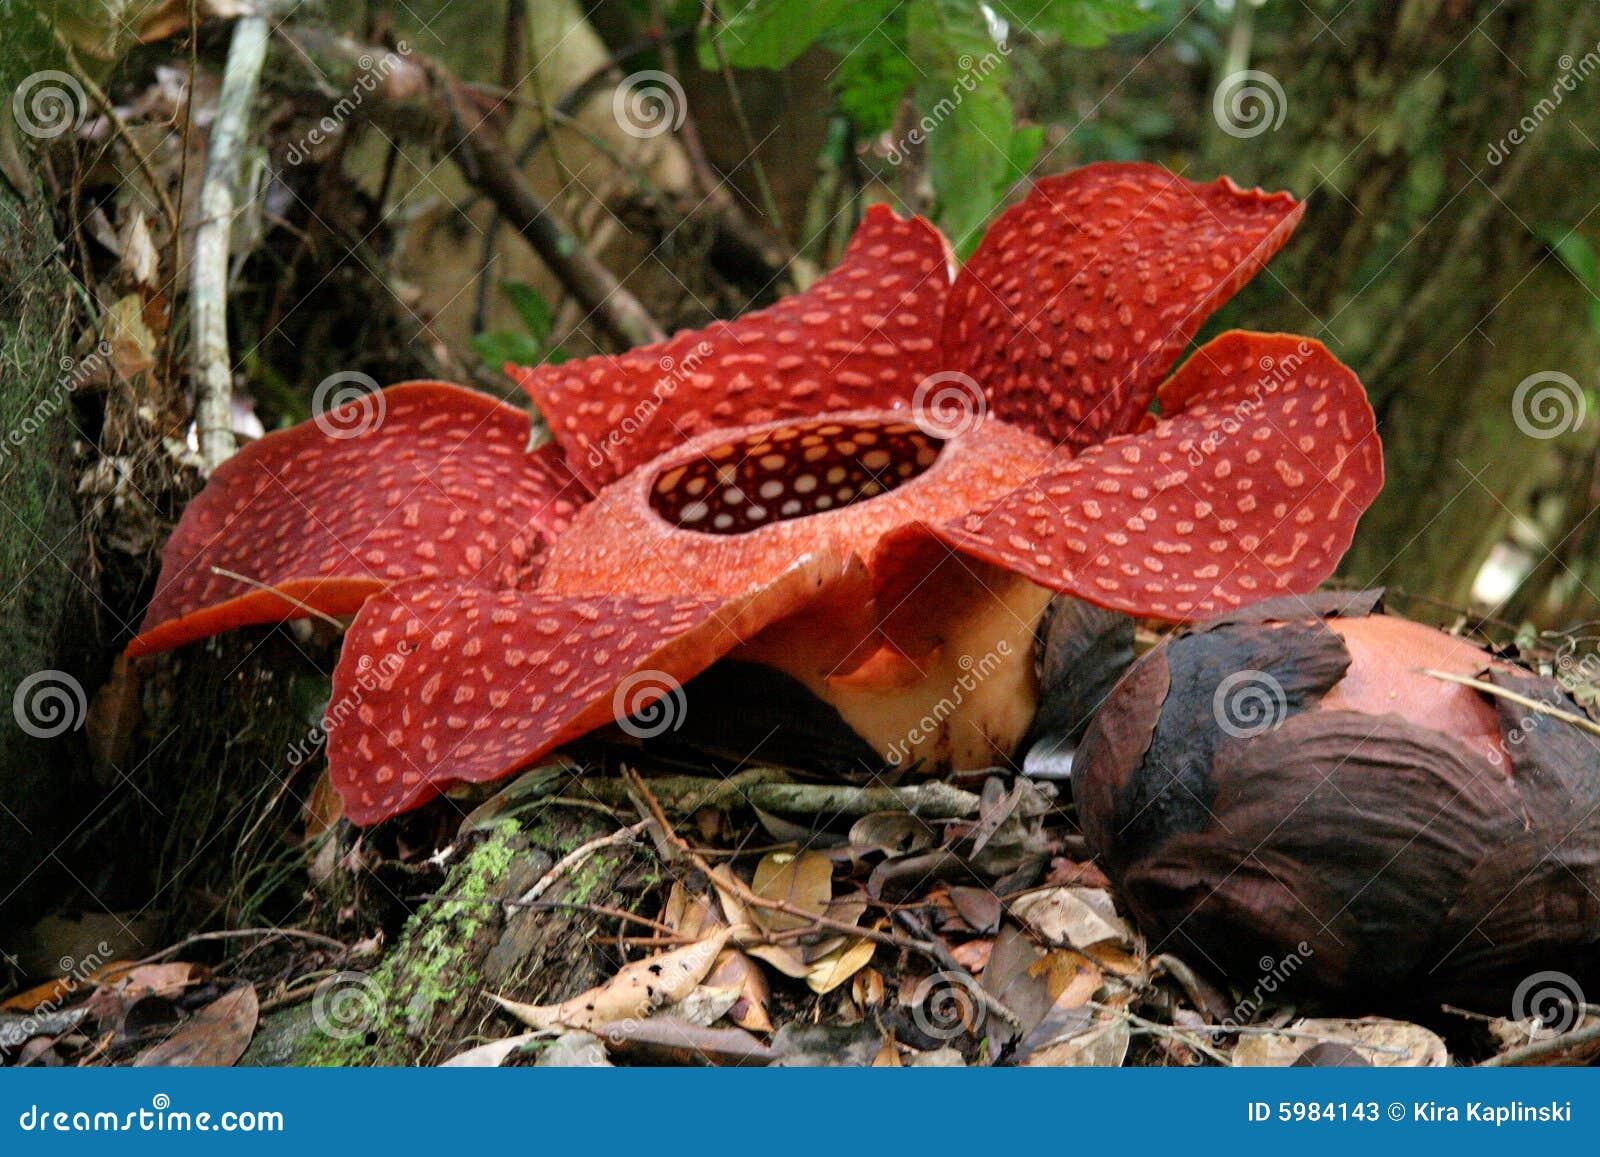 Rafflesia, the biggest flower in the world